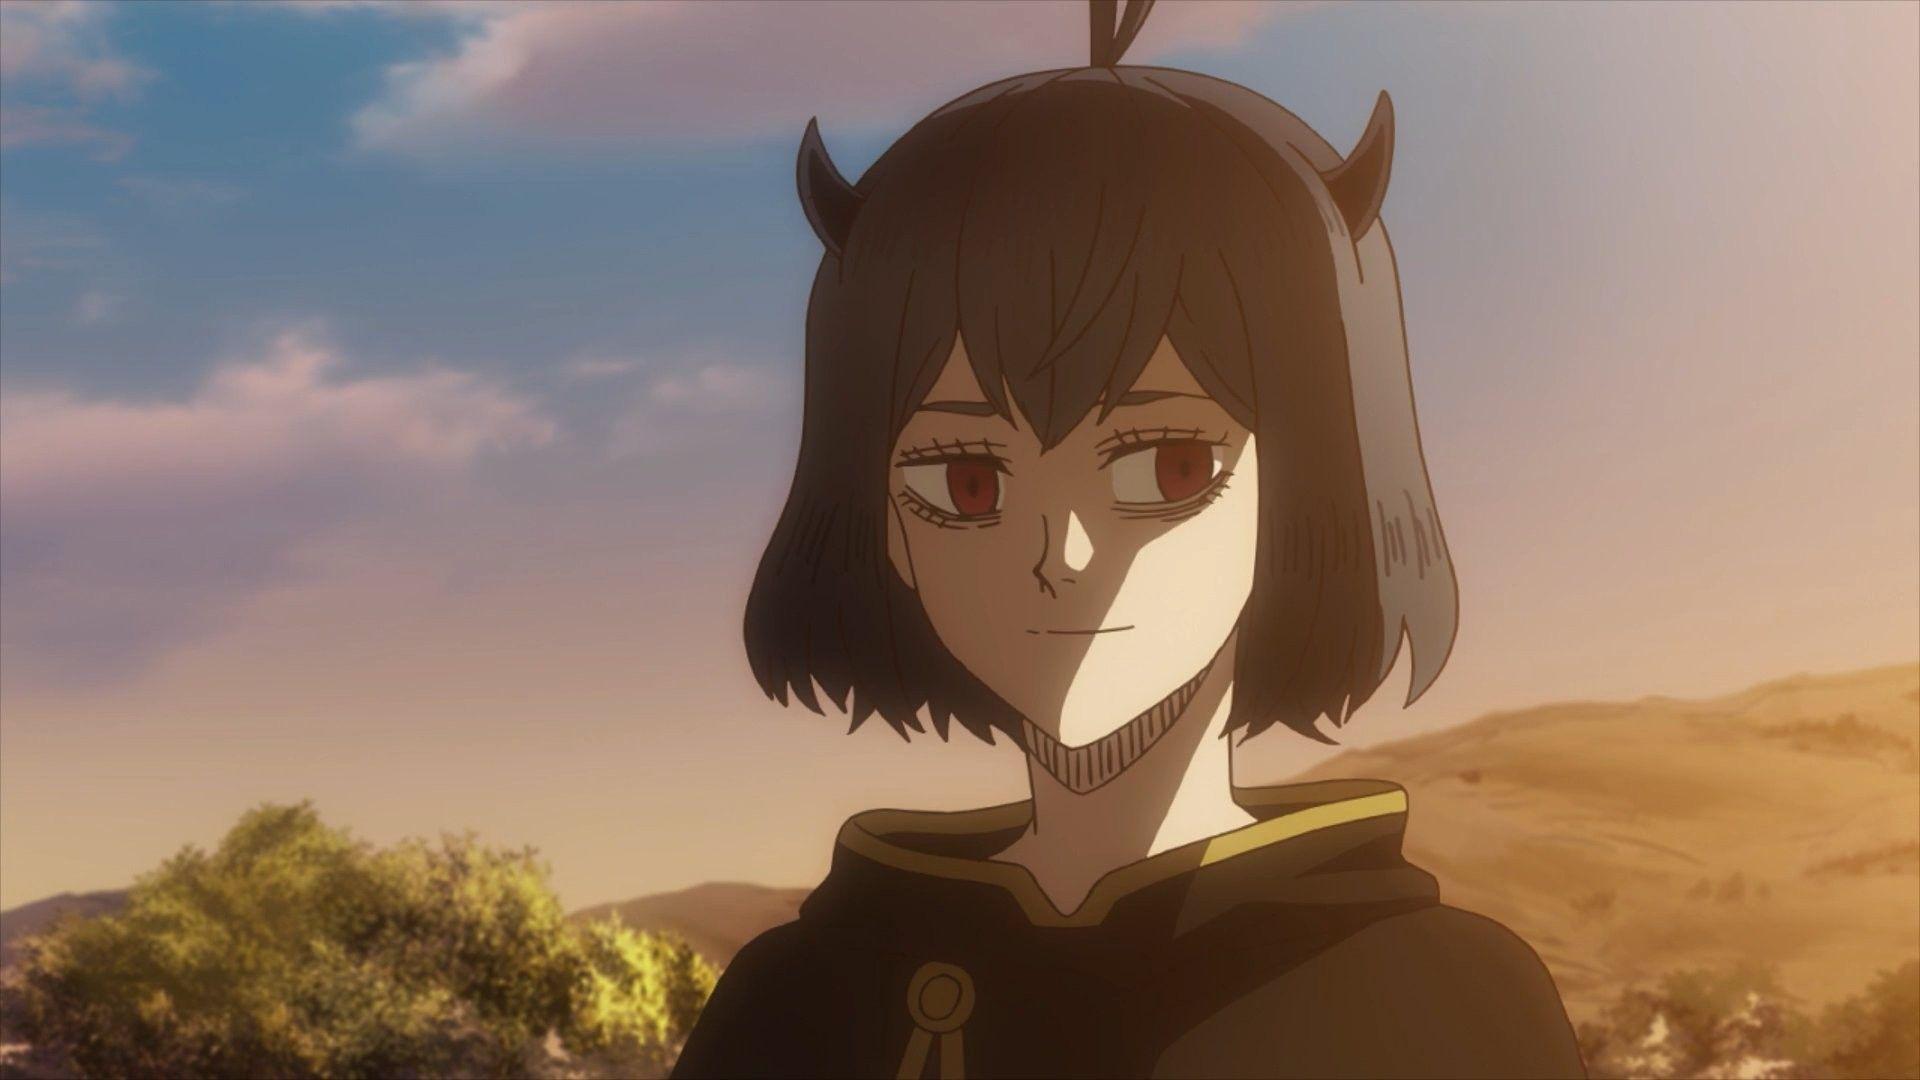 Secre Swallowtail Nero Black Clover Anime Films Aesthetic Anime Anime